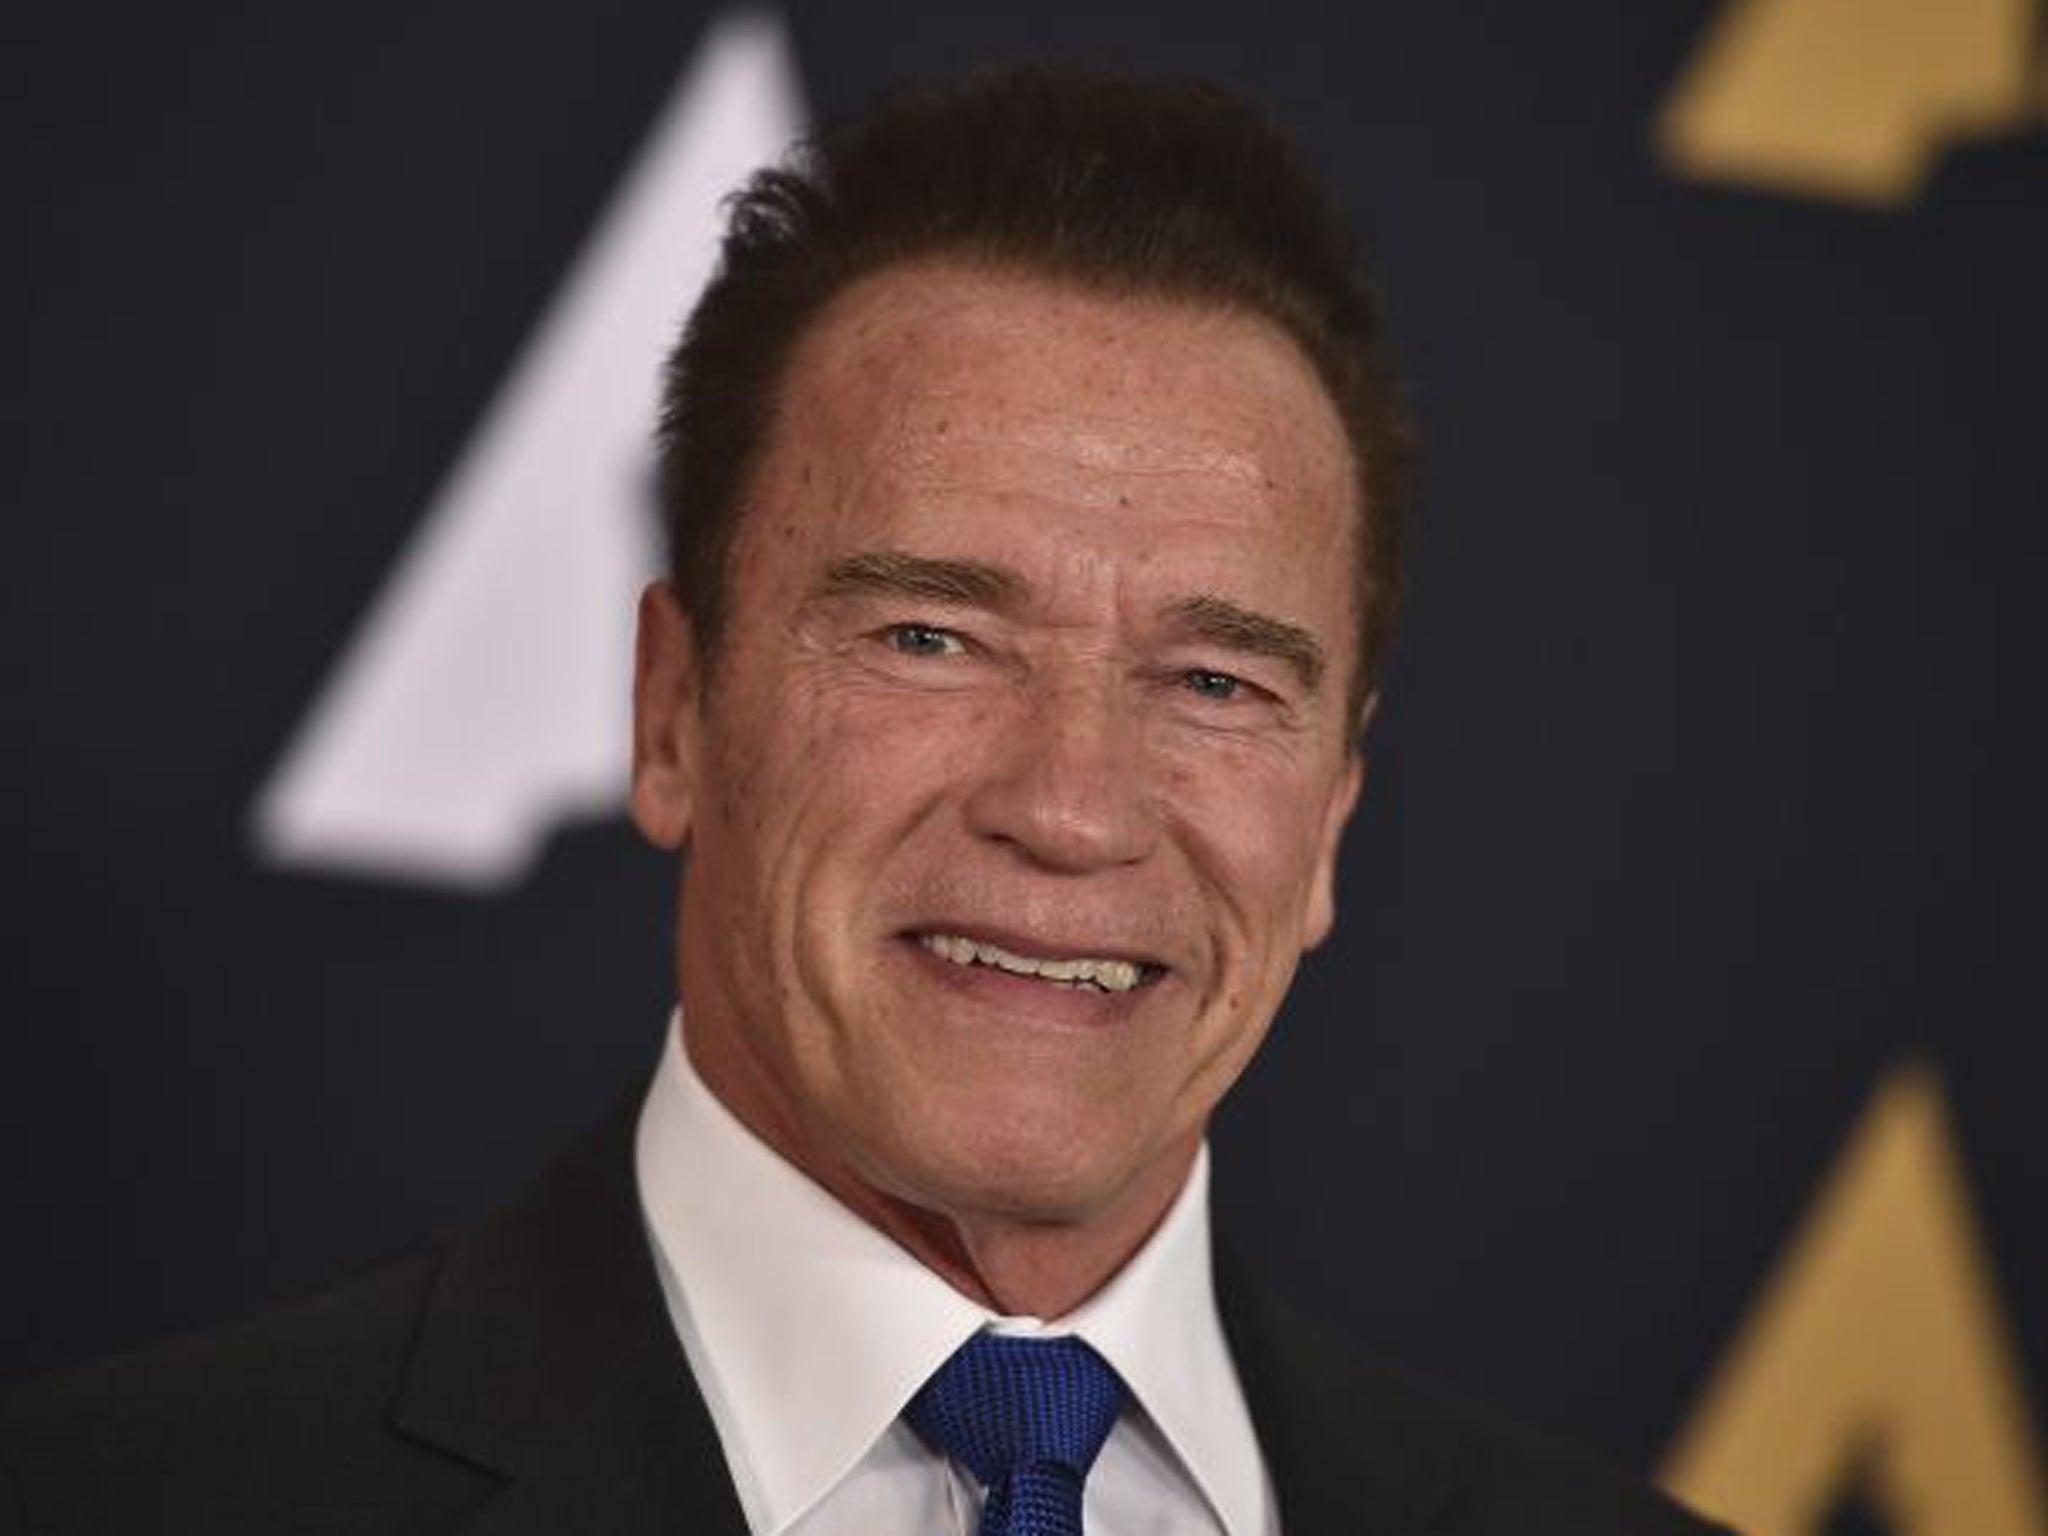 Arnold Schwarzenegger 71 Years Old And Still Training like ...  |Arnold Schwarzenegger